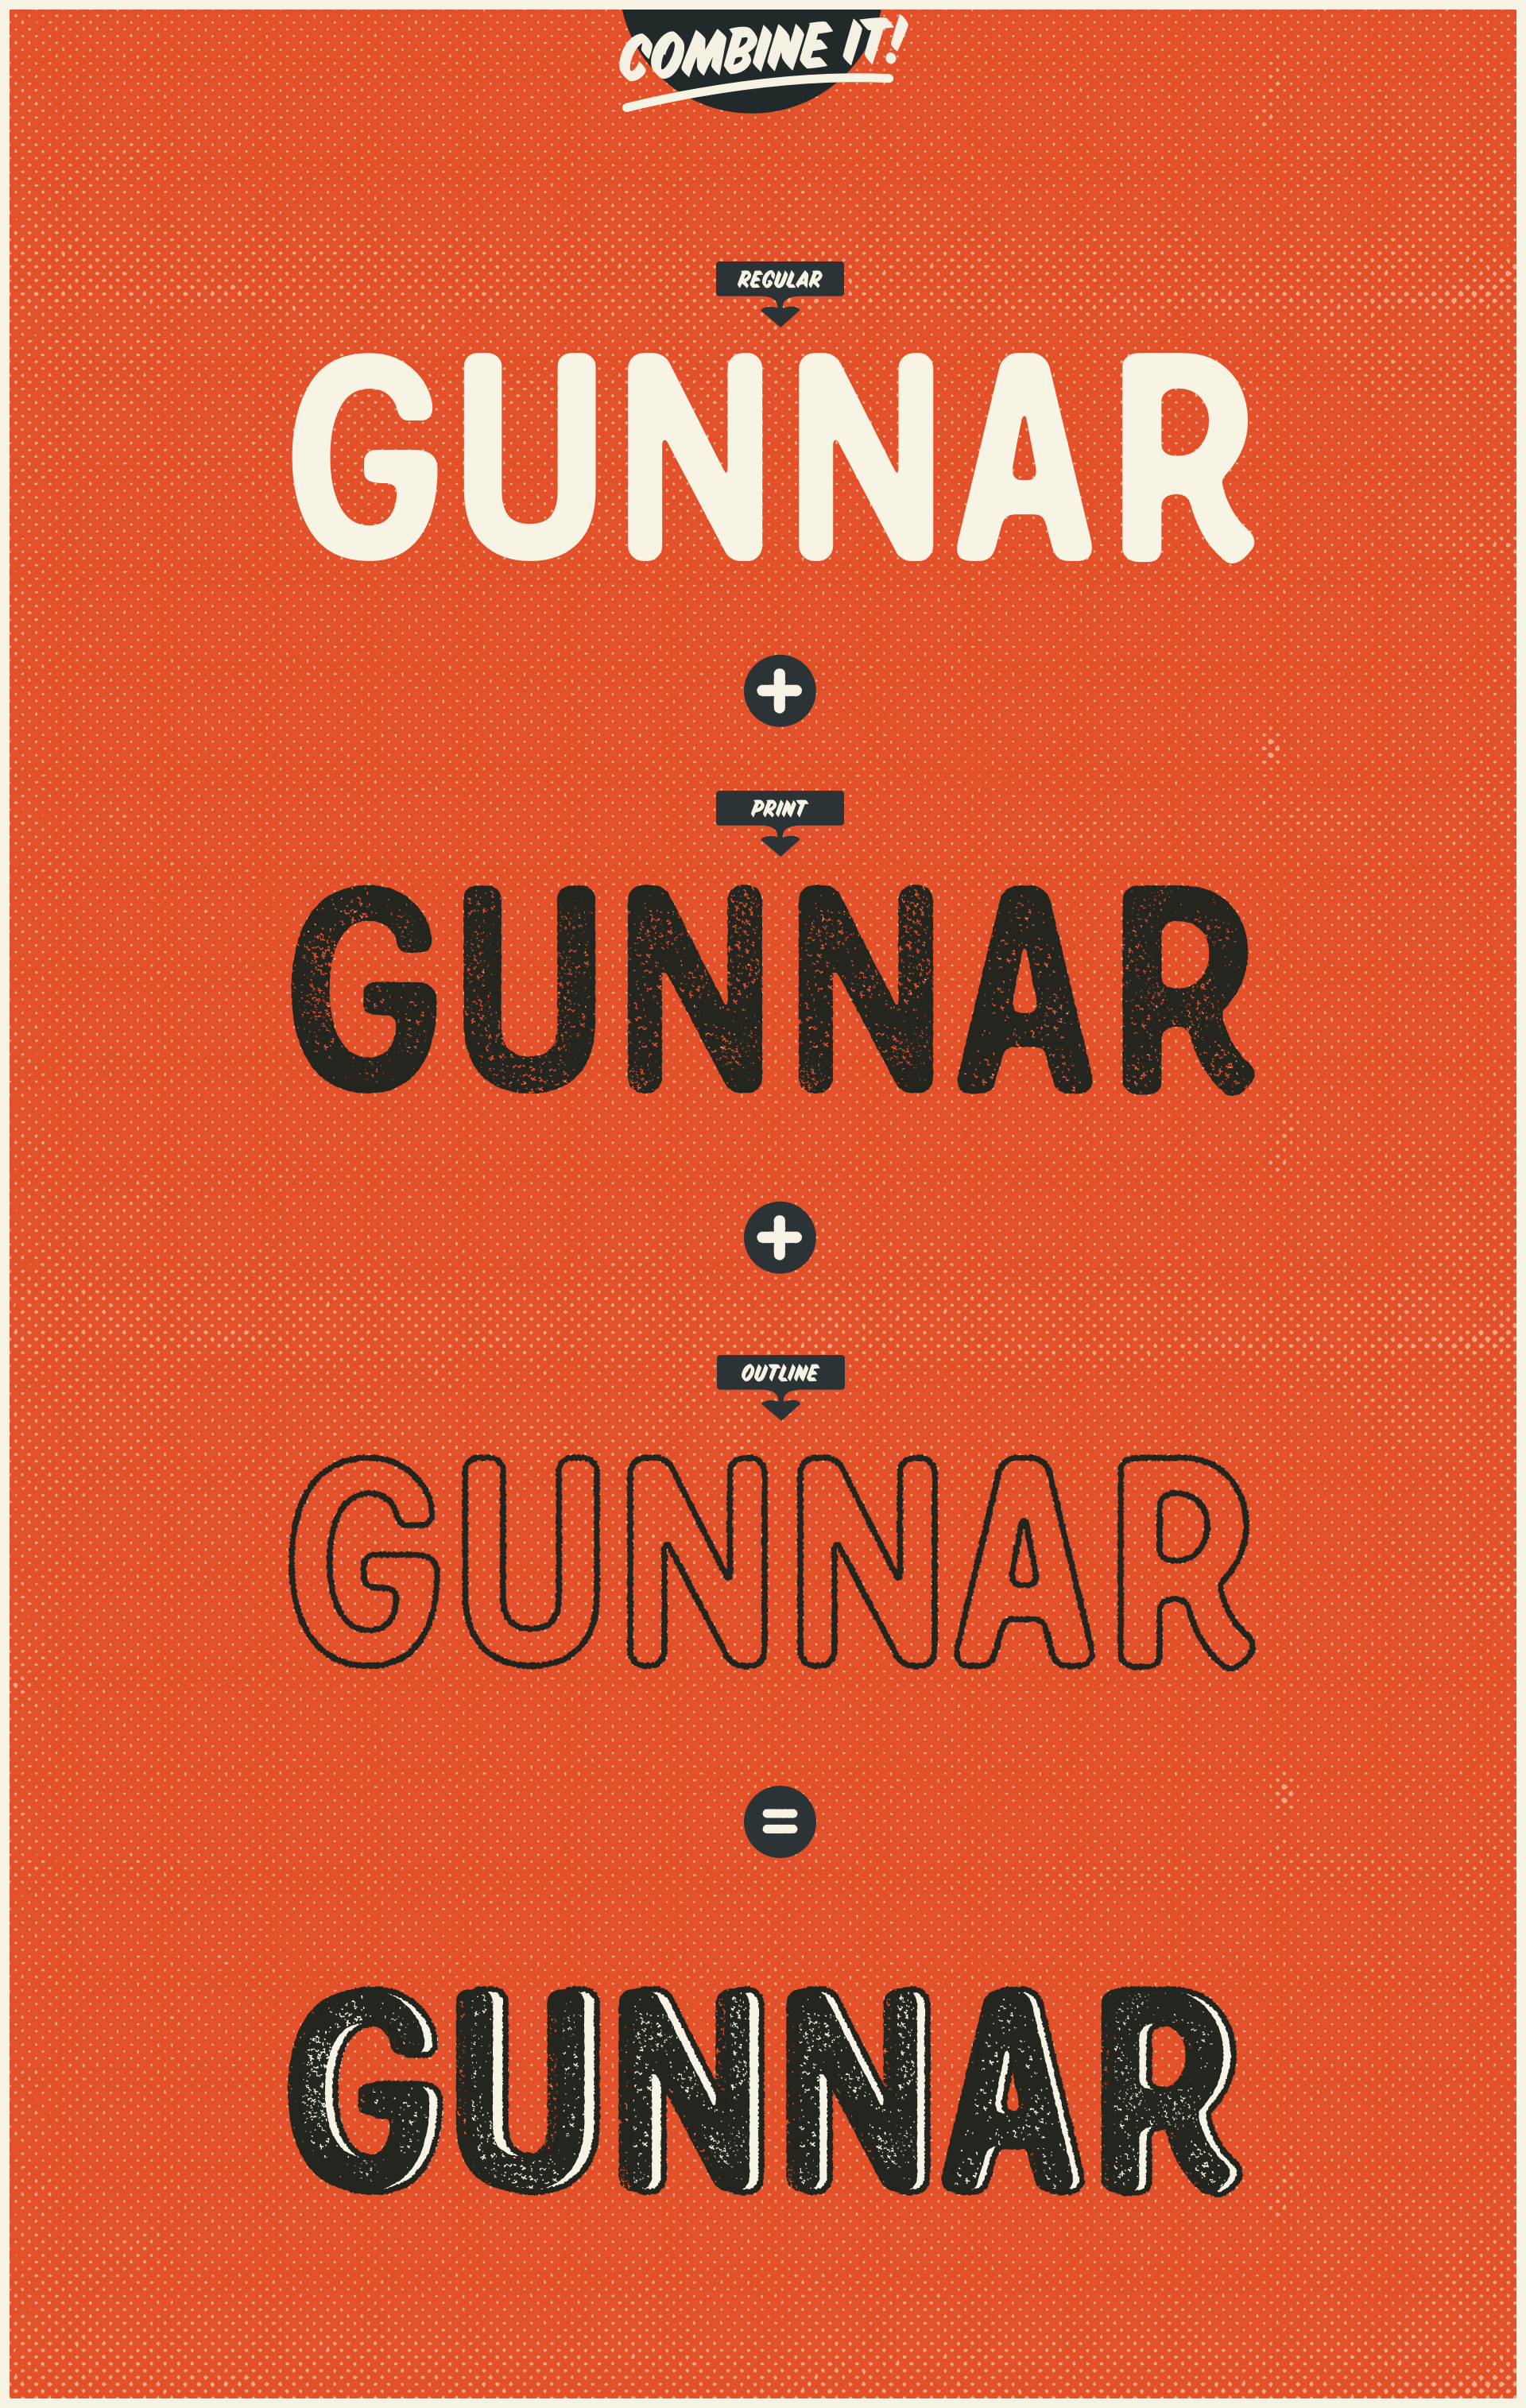 Gunnar on DN - 2.png